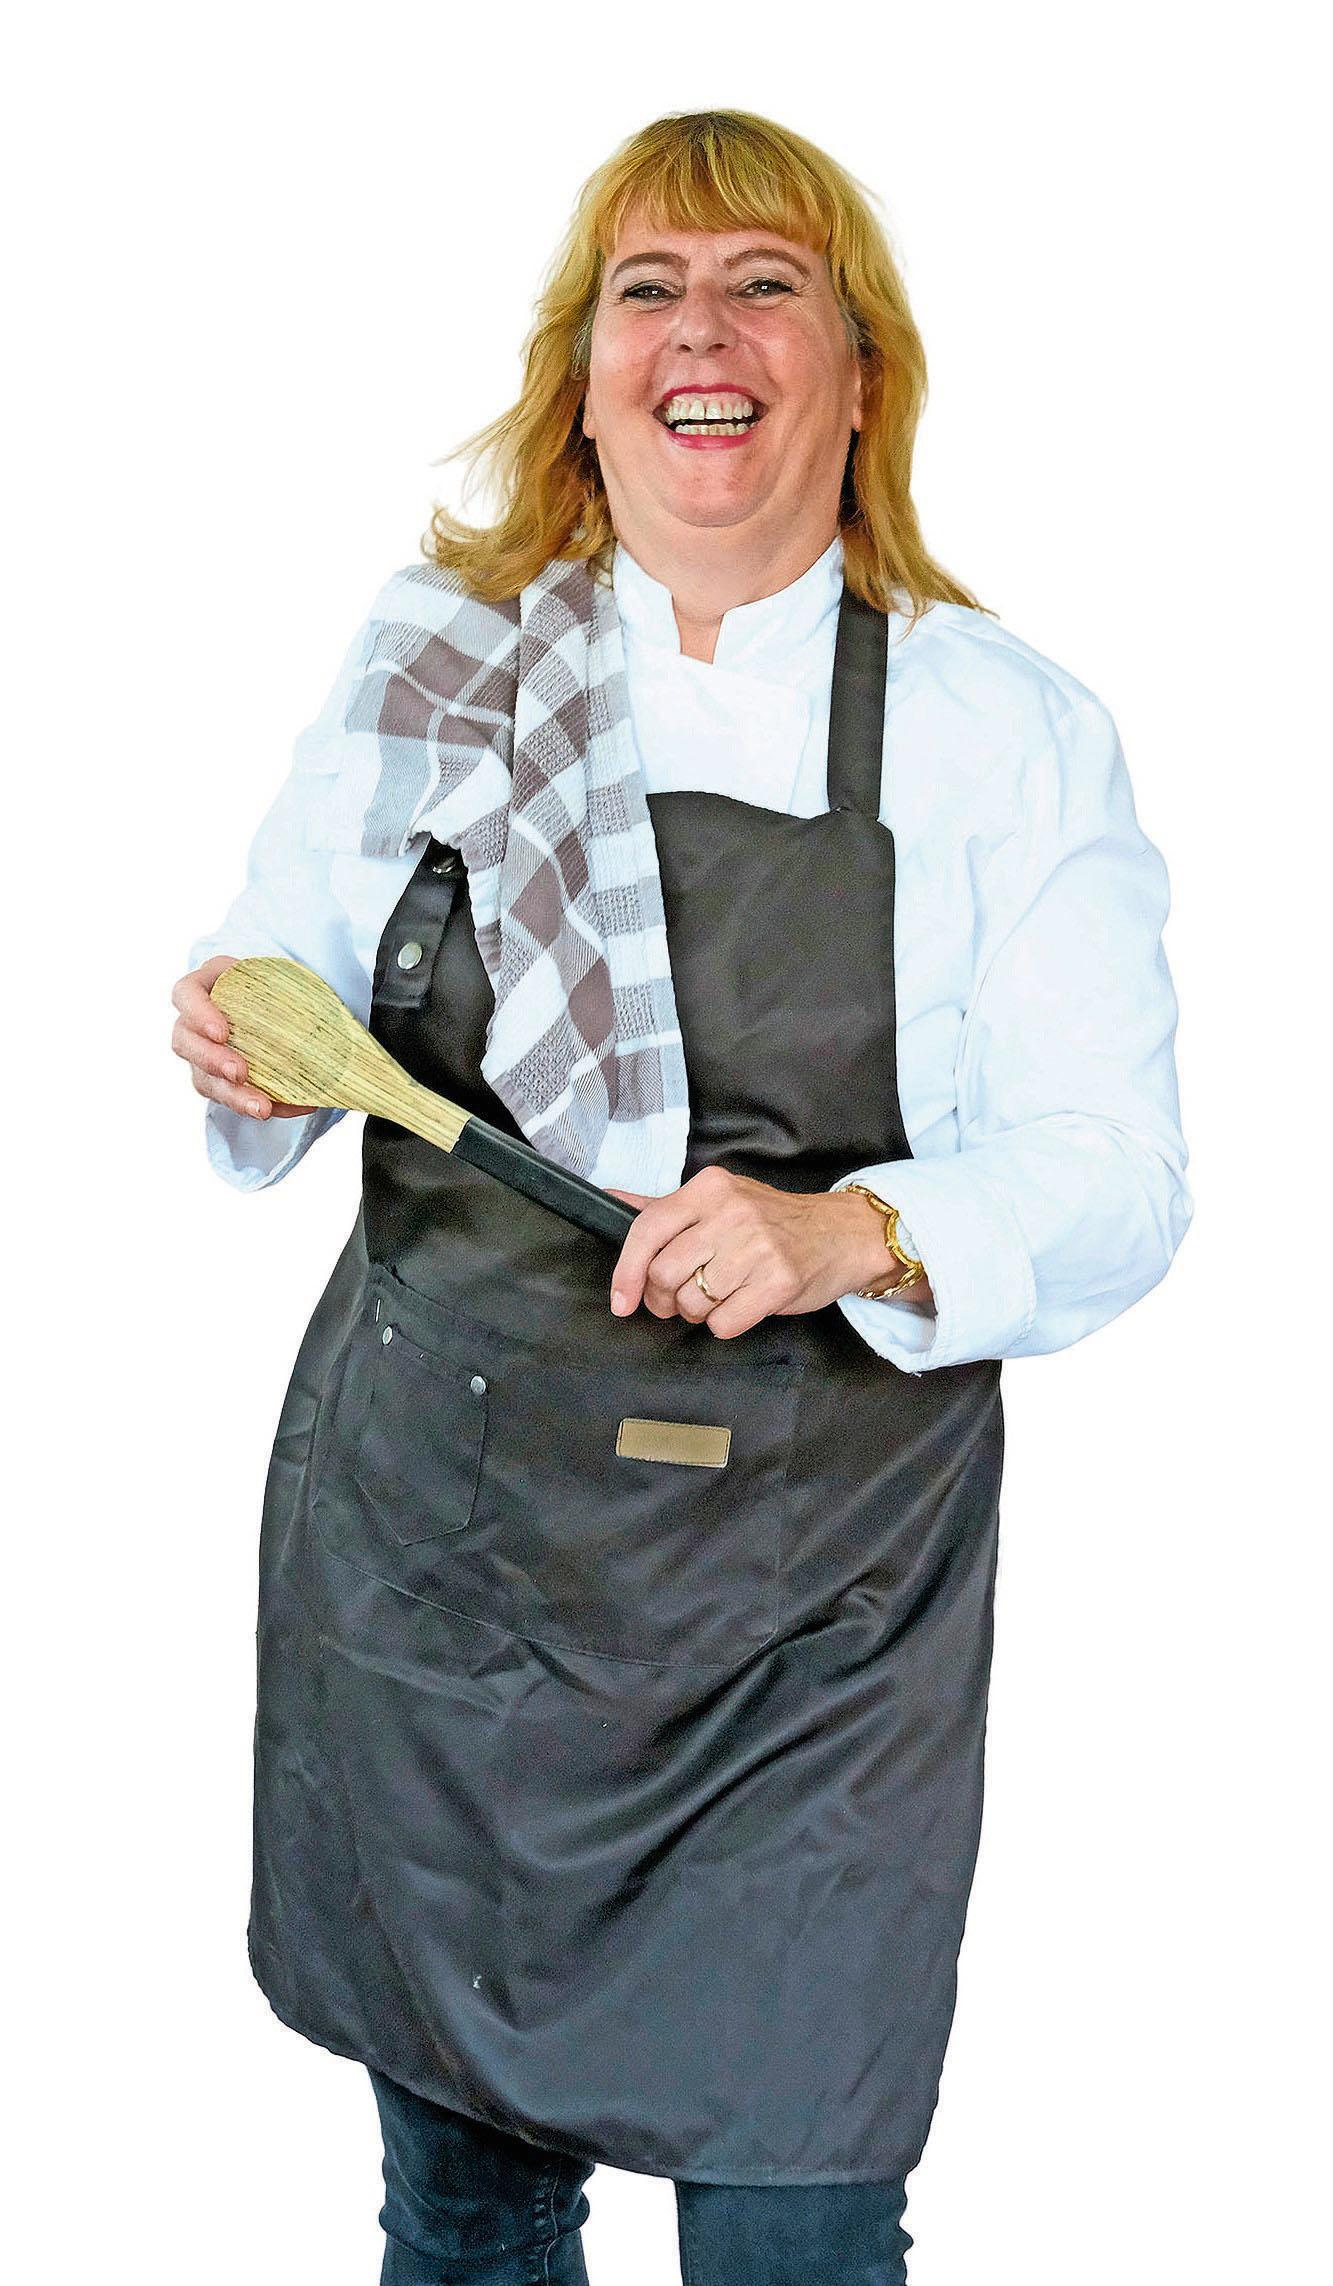 Nanja Pol kookt op minder dan anderhalve meter